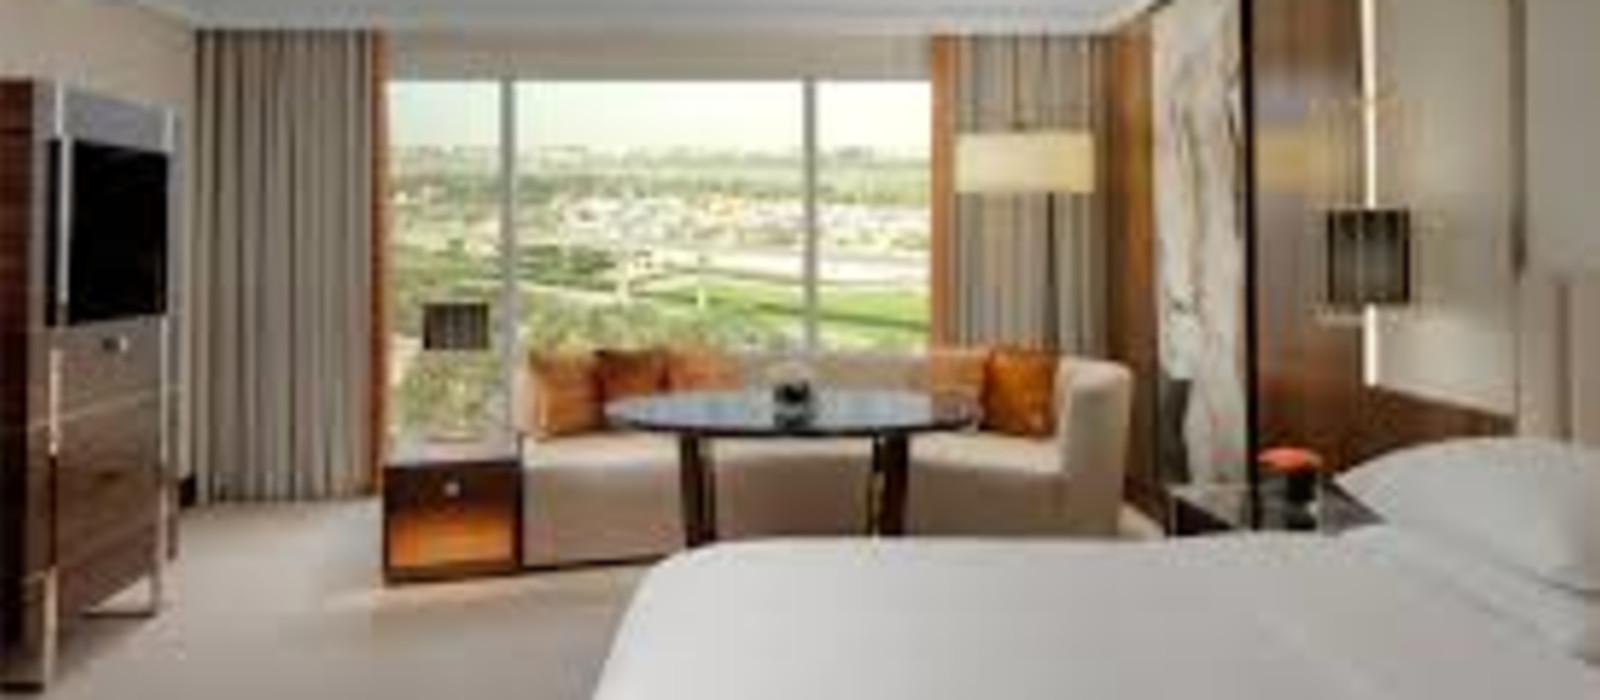 Hotel Grand Hyatt Dubai United Arab Emirates